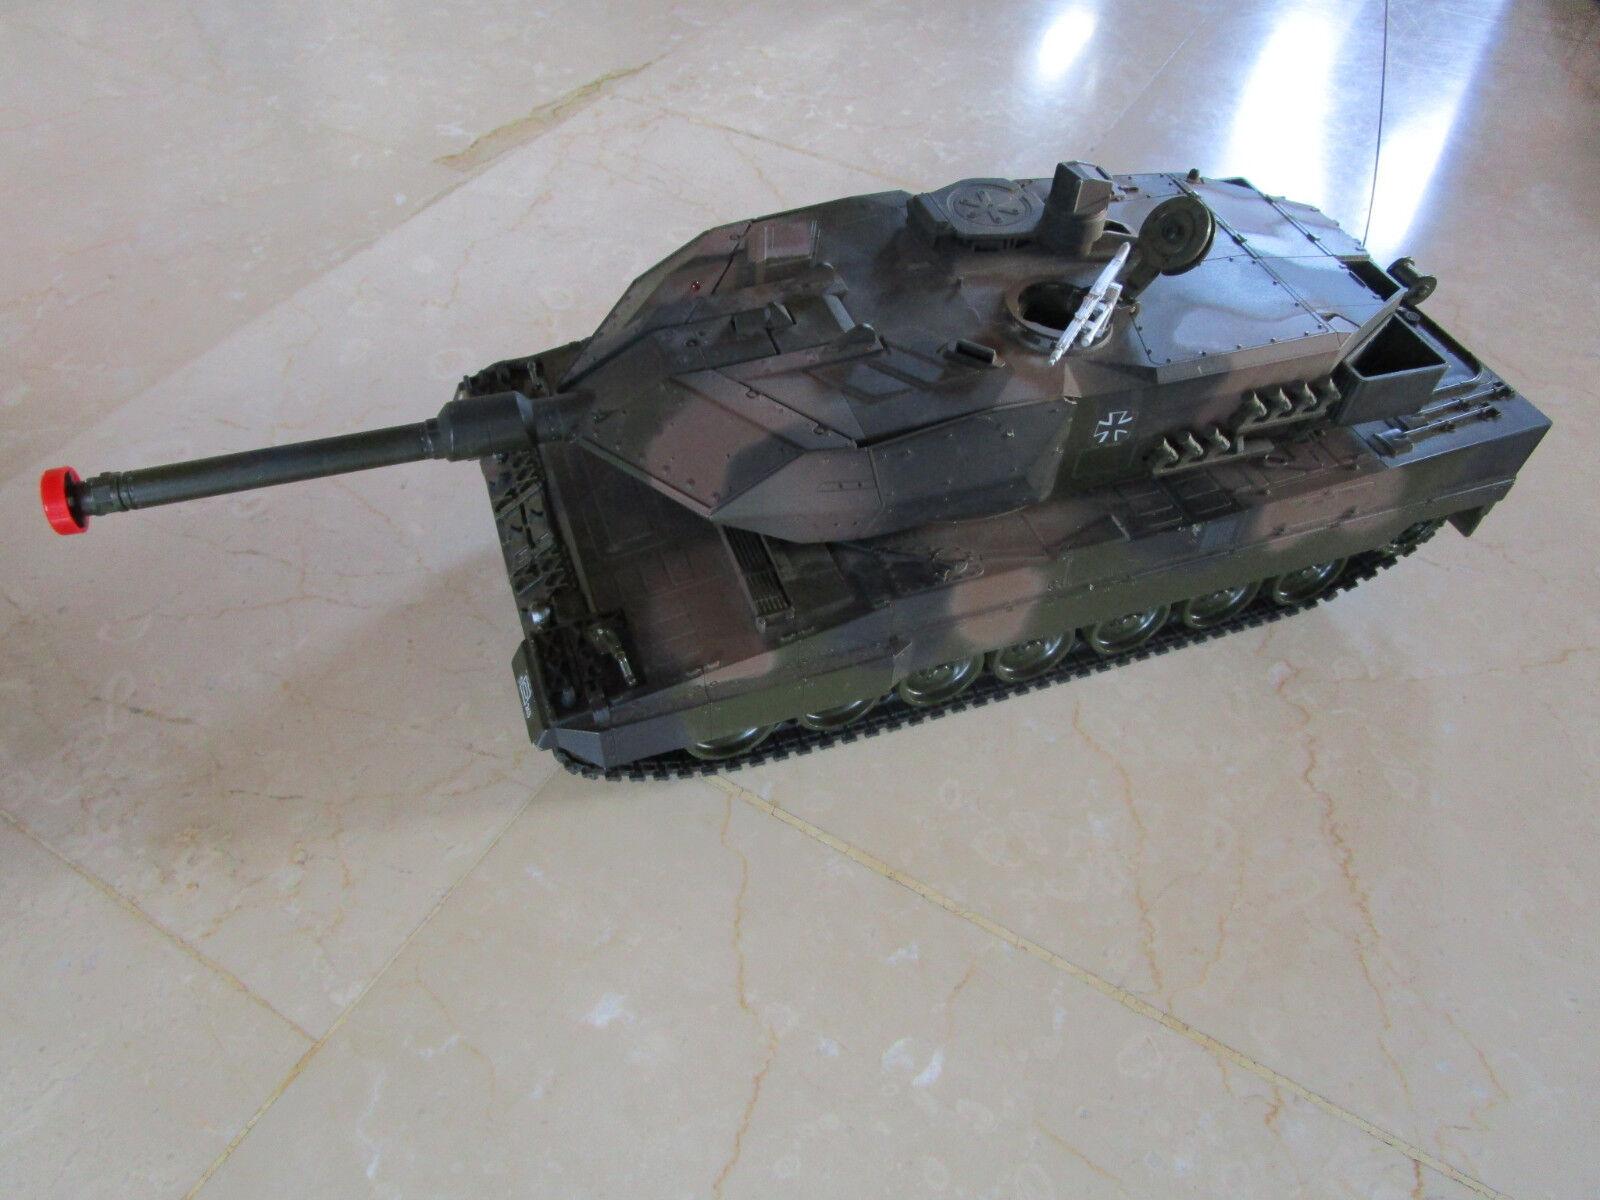 Akademy R C tanque leopard 2a5, 1 25 scale, con control remoto, en OVP coleccionista, fans